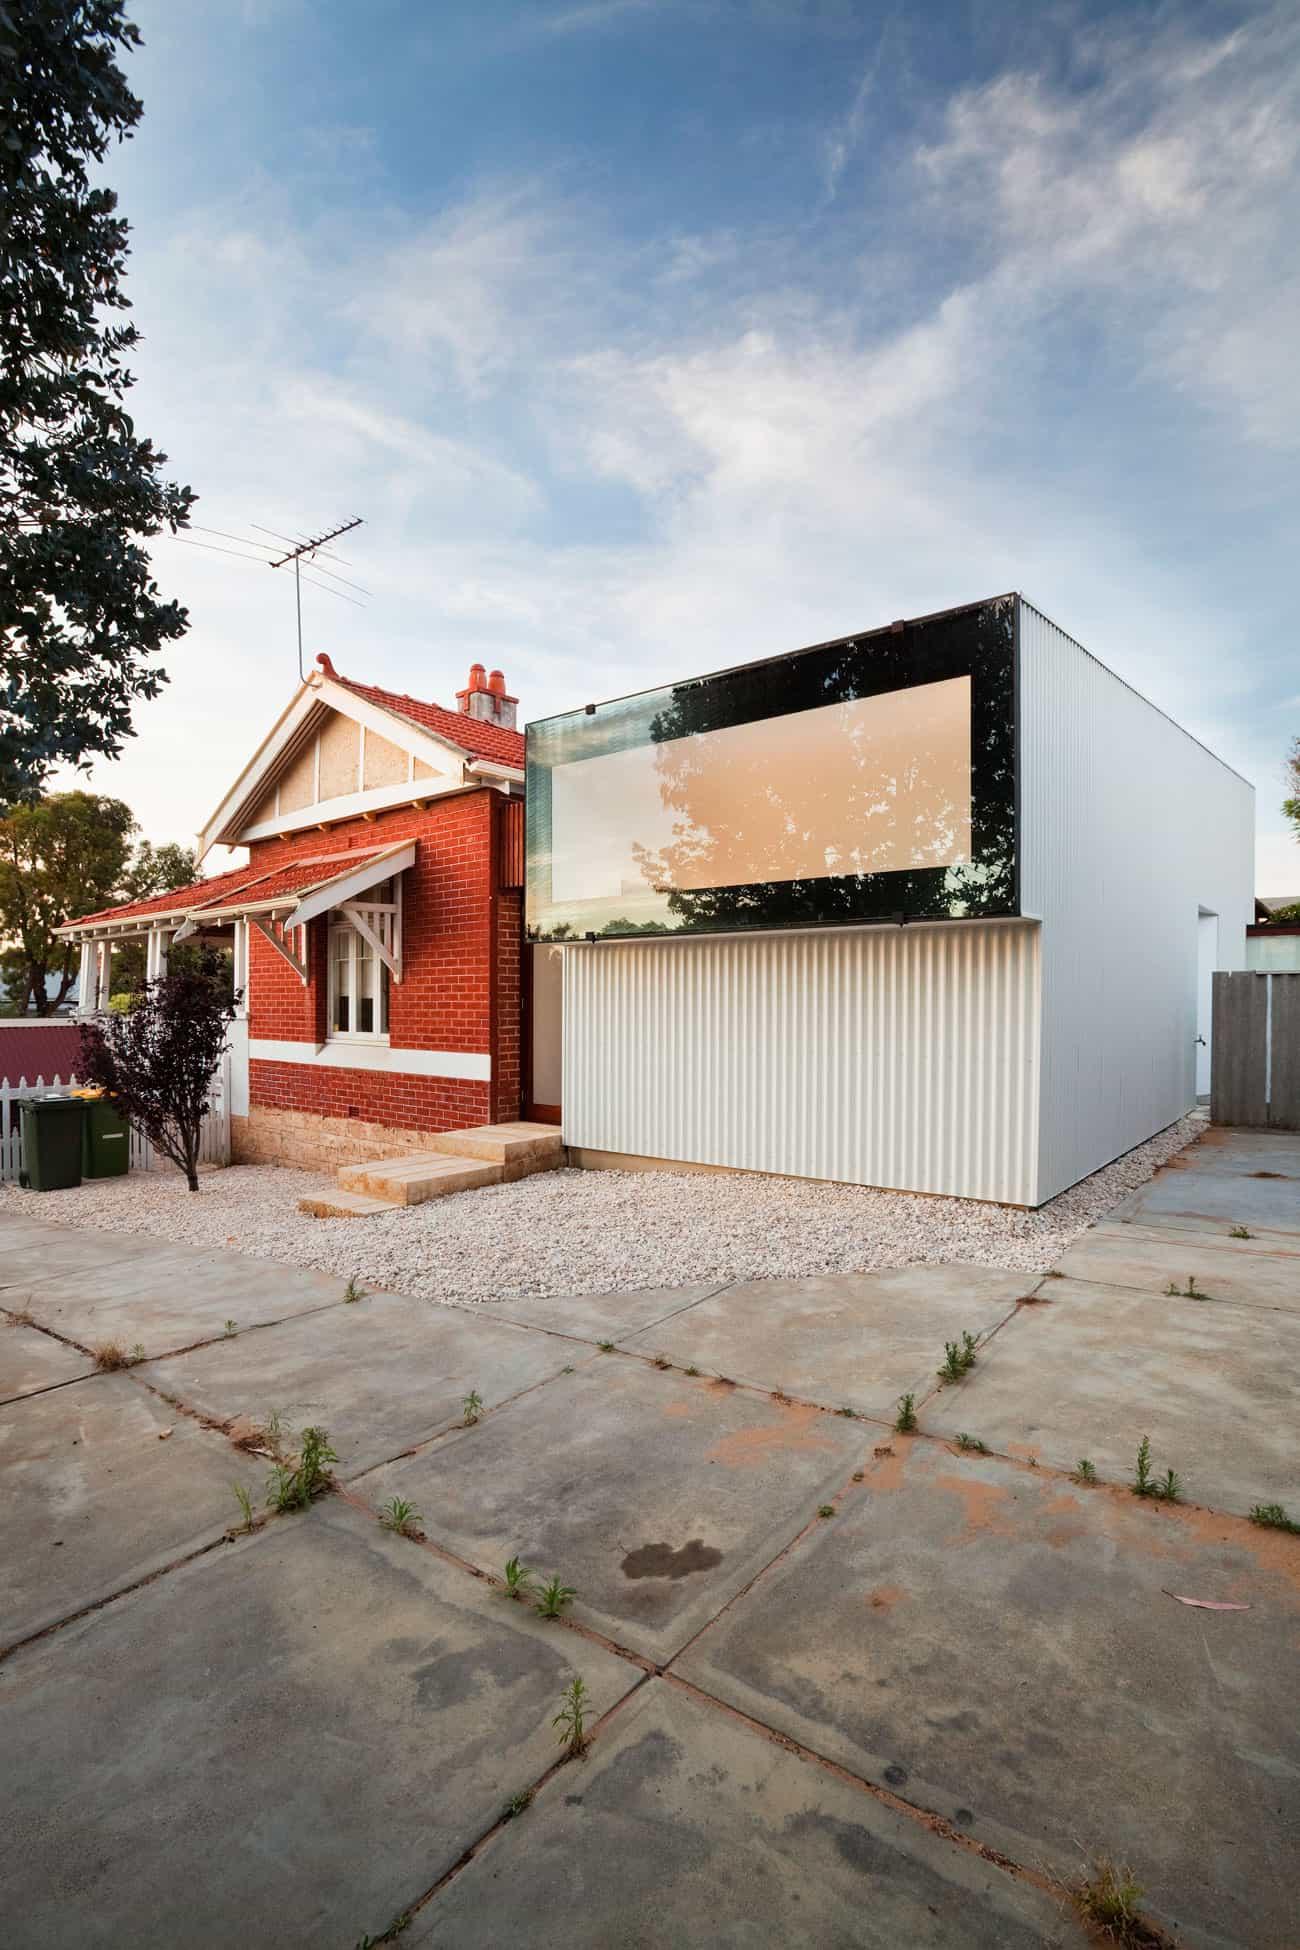 Westbury Crescent Residence by David Barr Architect